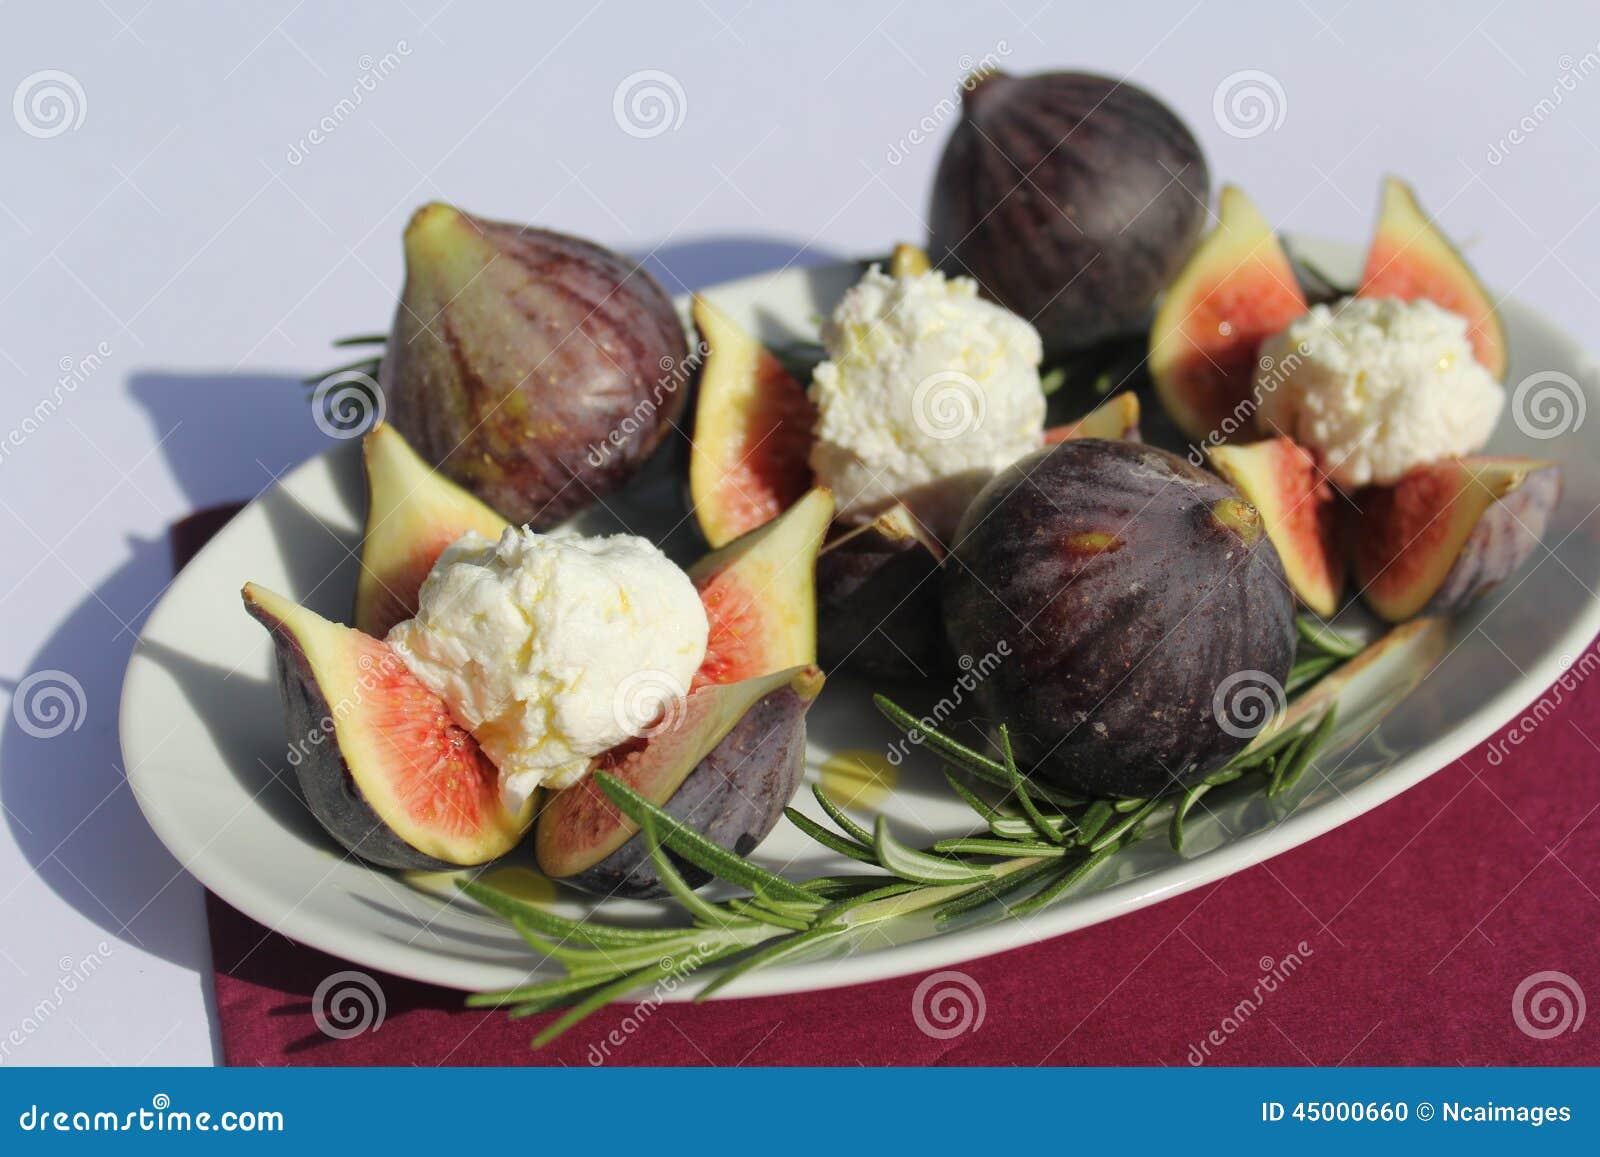 Figs Stock Photo - Image: 45000660